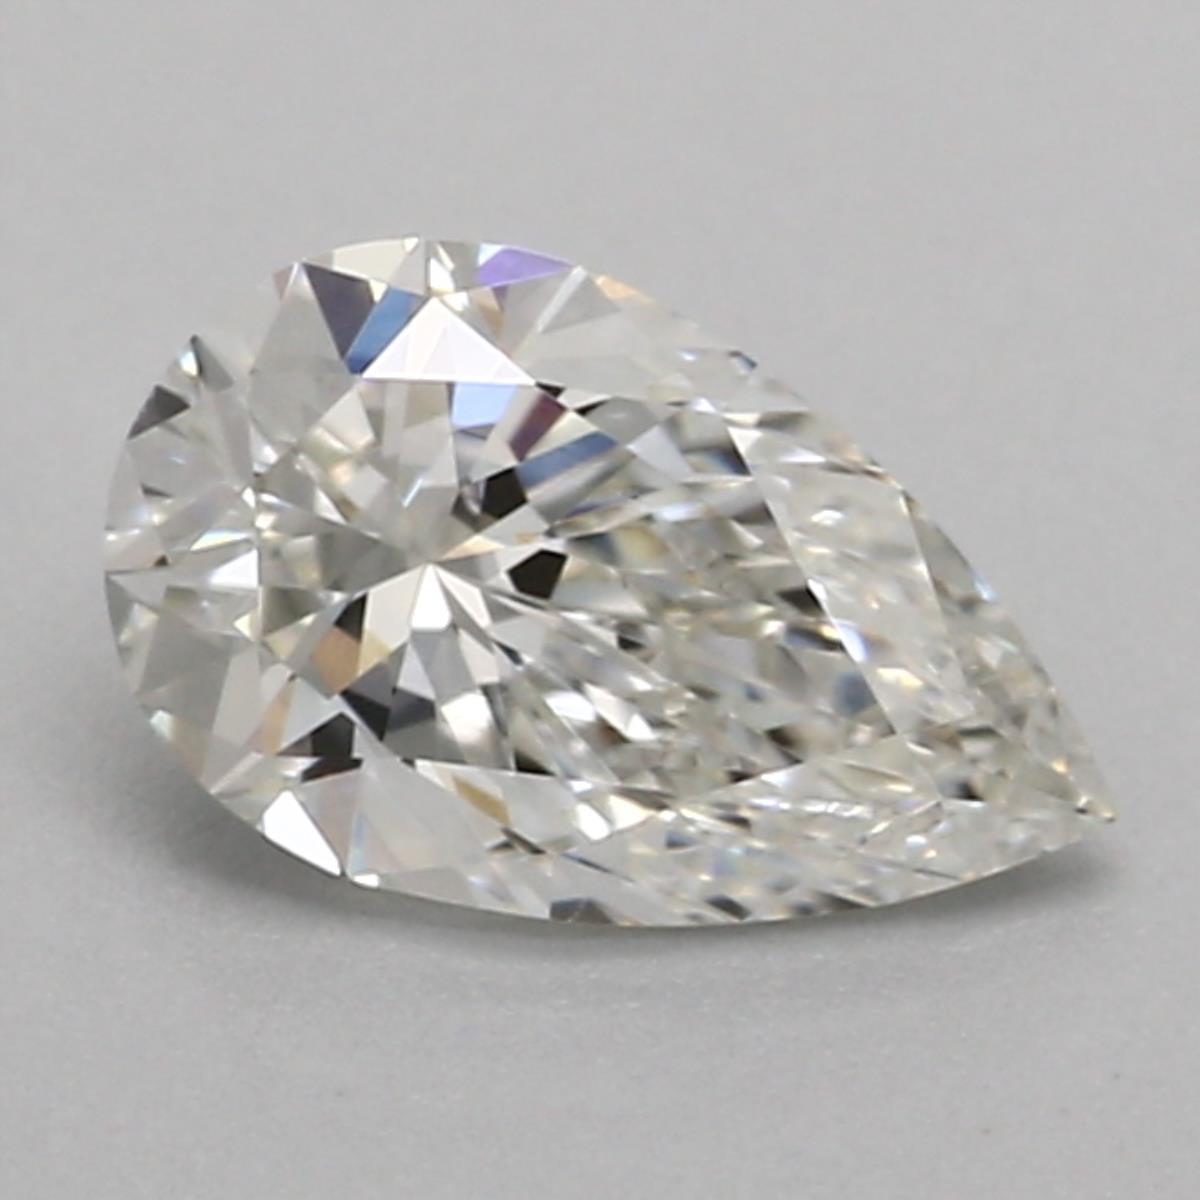 0.31 ct Pear Shape Diamond : I / VS1